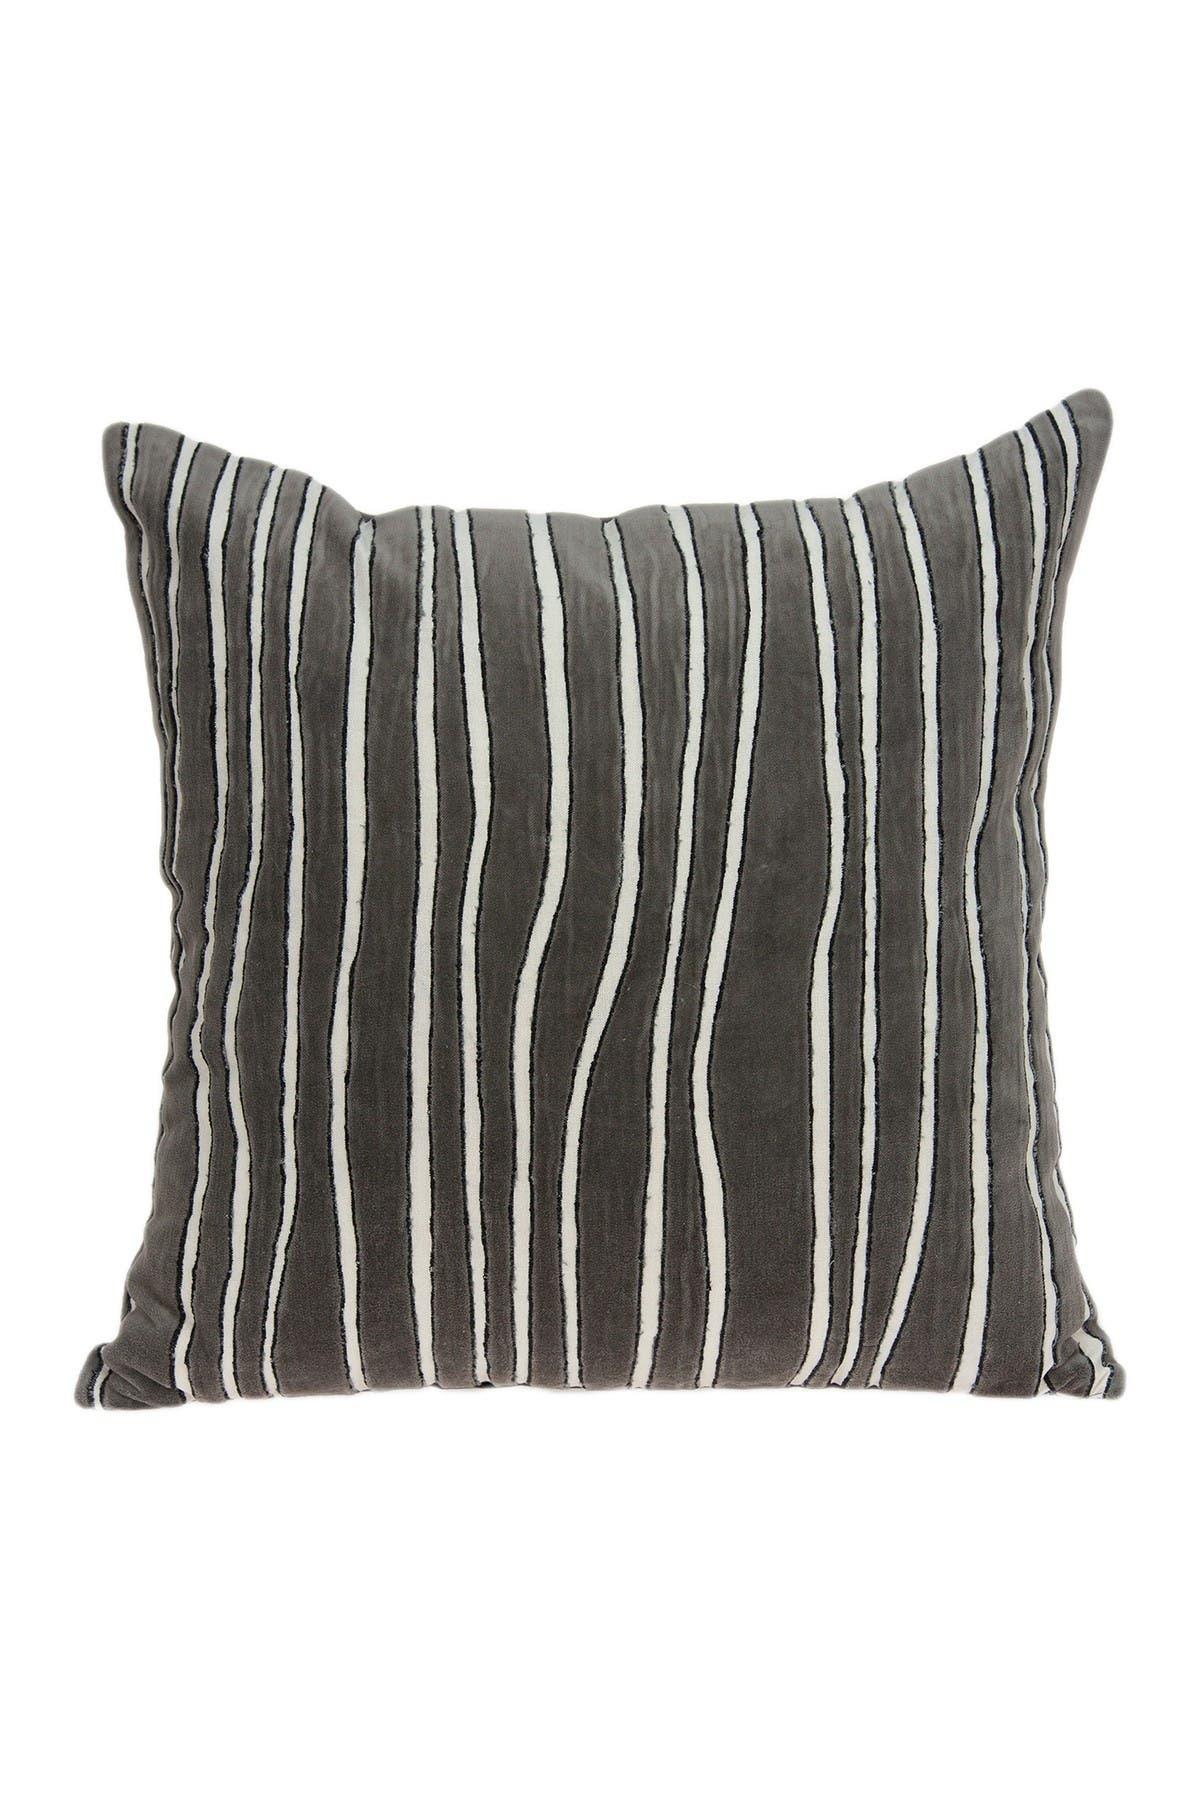 "Image of Parkland Collection Pilan Transitional Pillow - 20"" x 20"" - Grey"